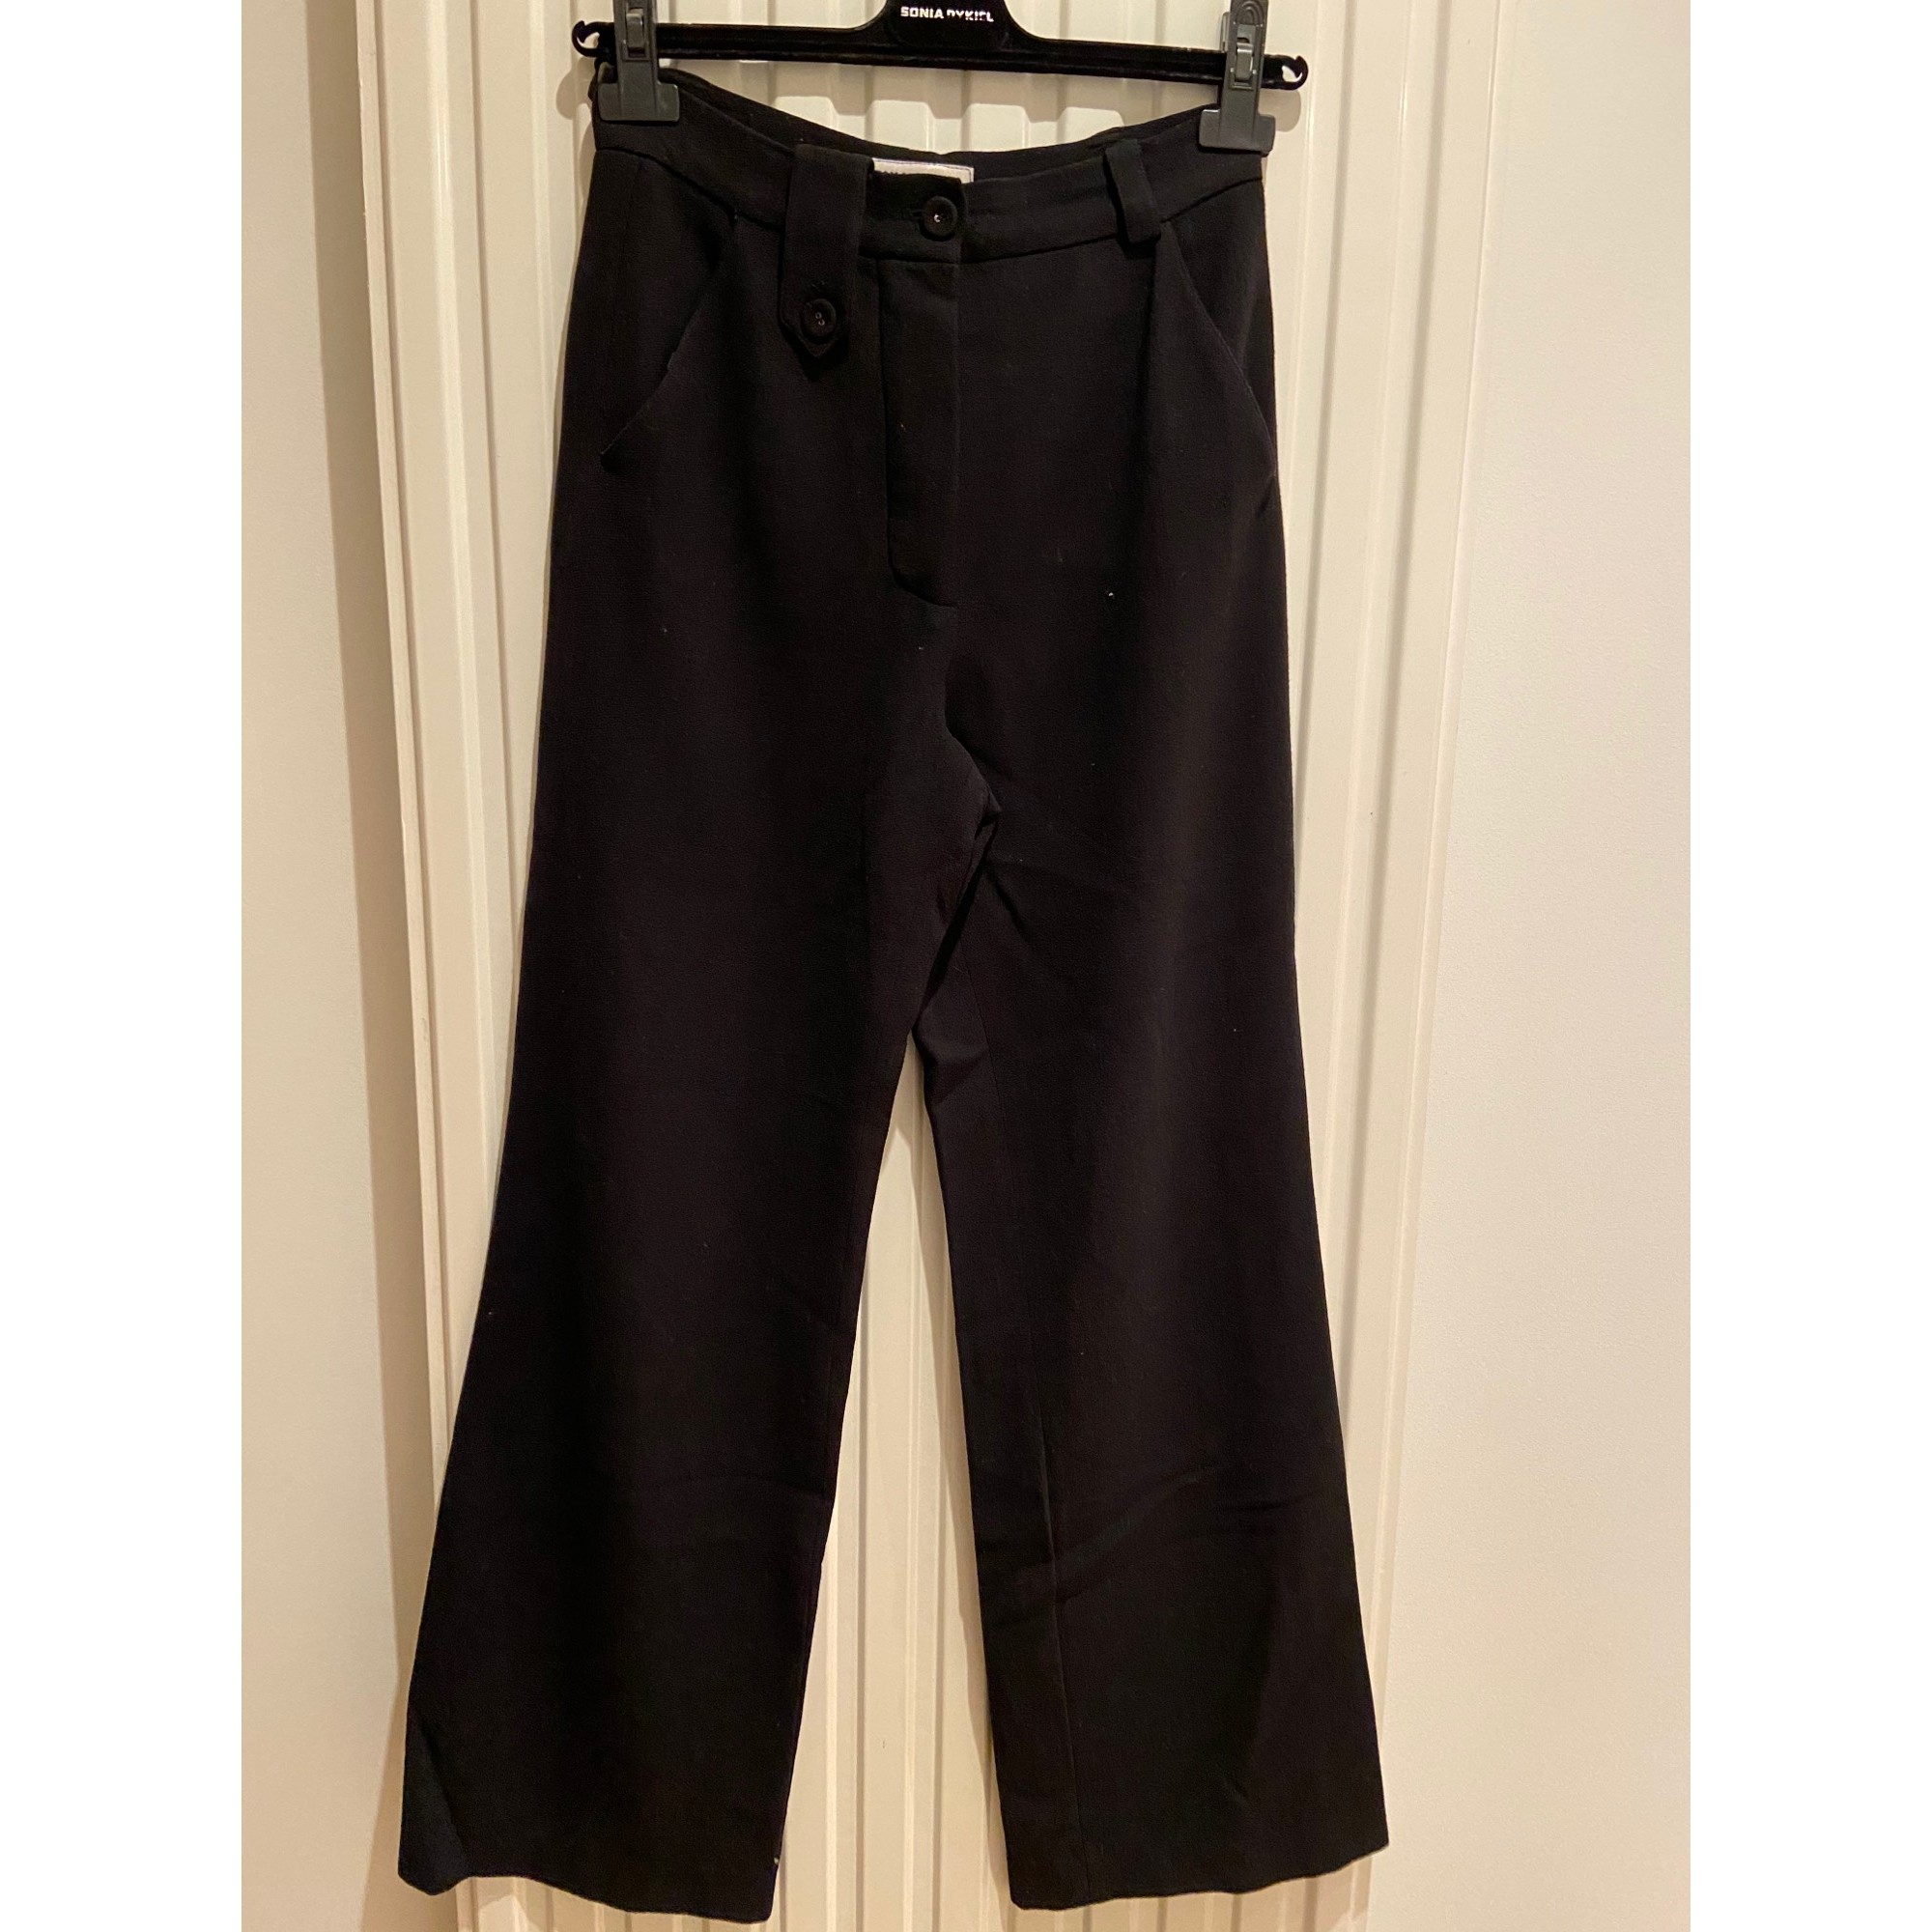 Pantalon large SONIA RYKIEL Noir